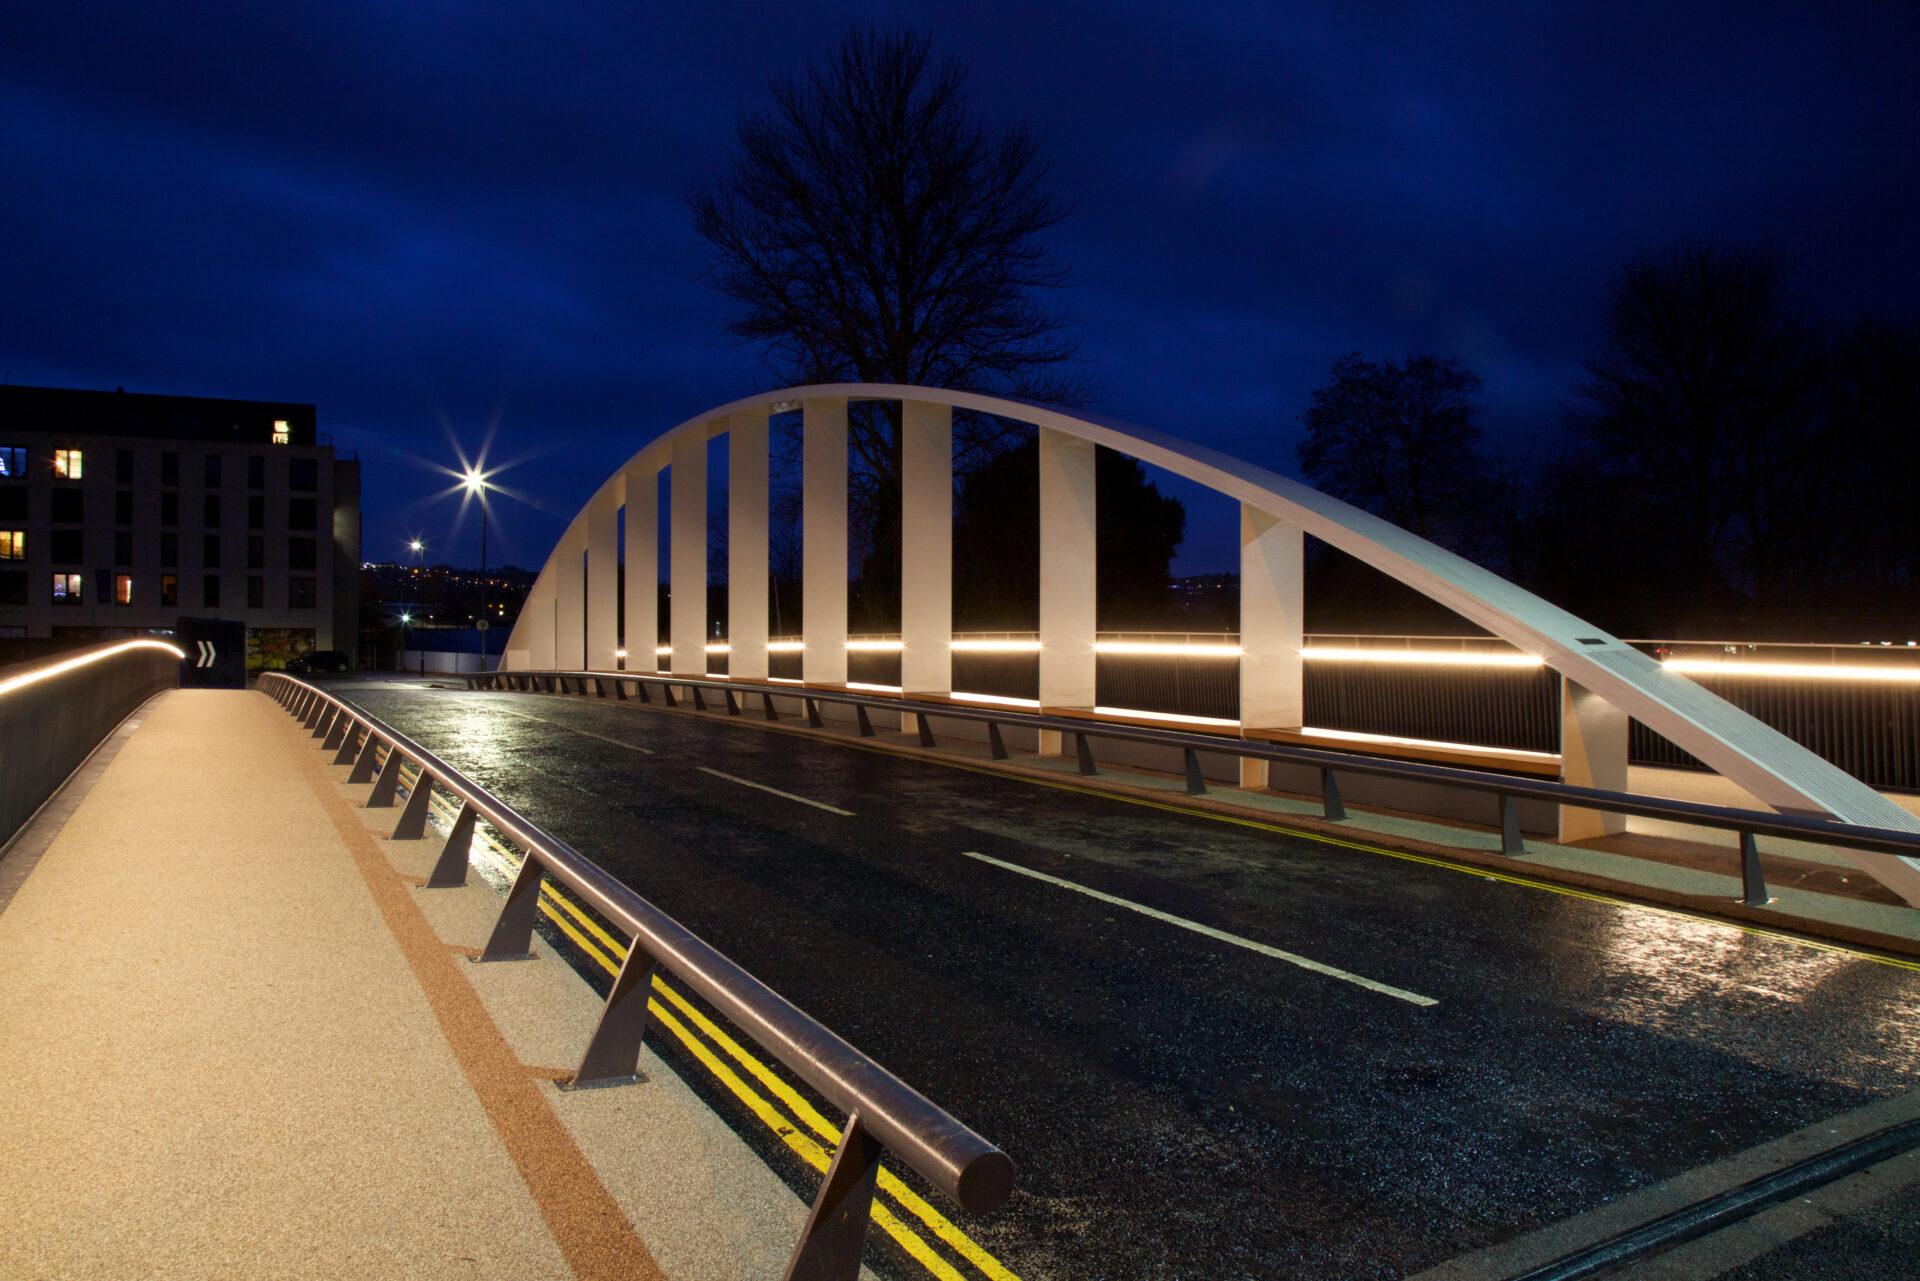 Destructor bridge lit up against a dark night sky